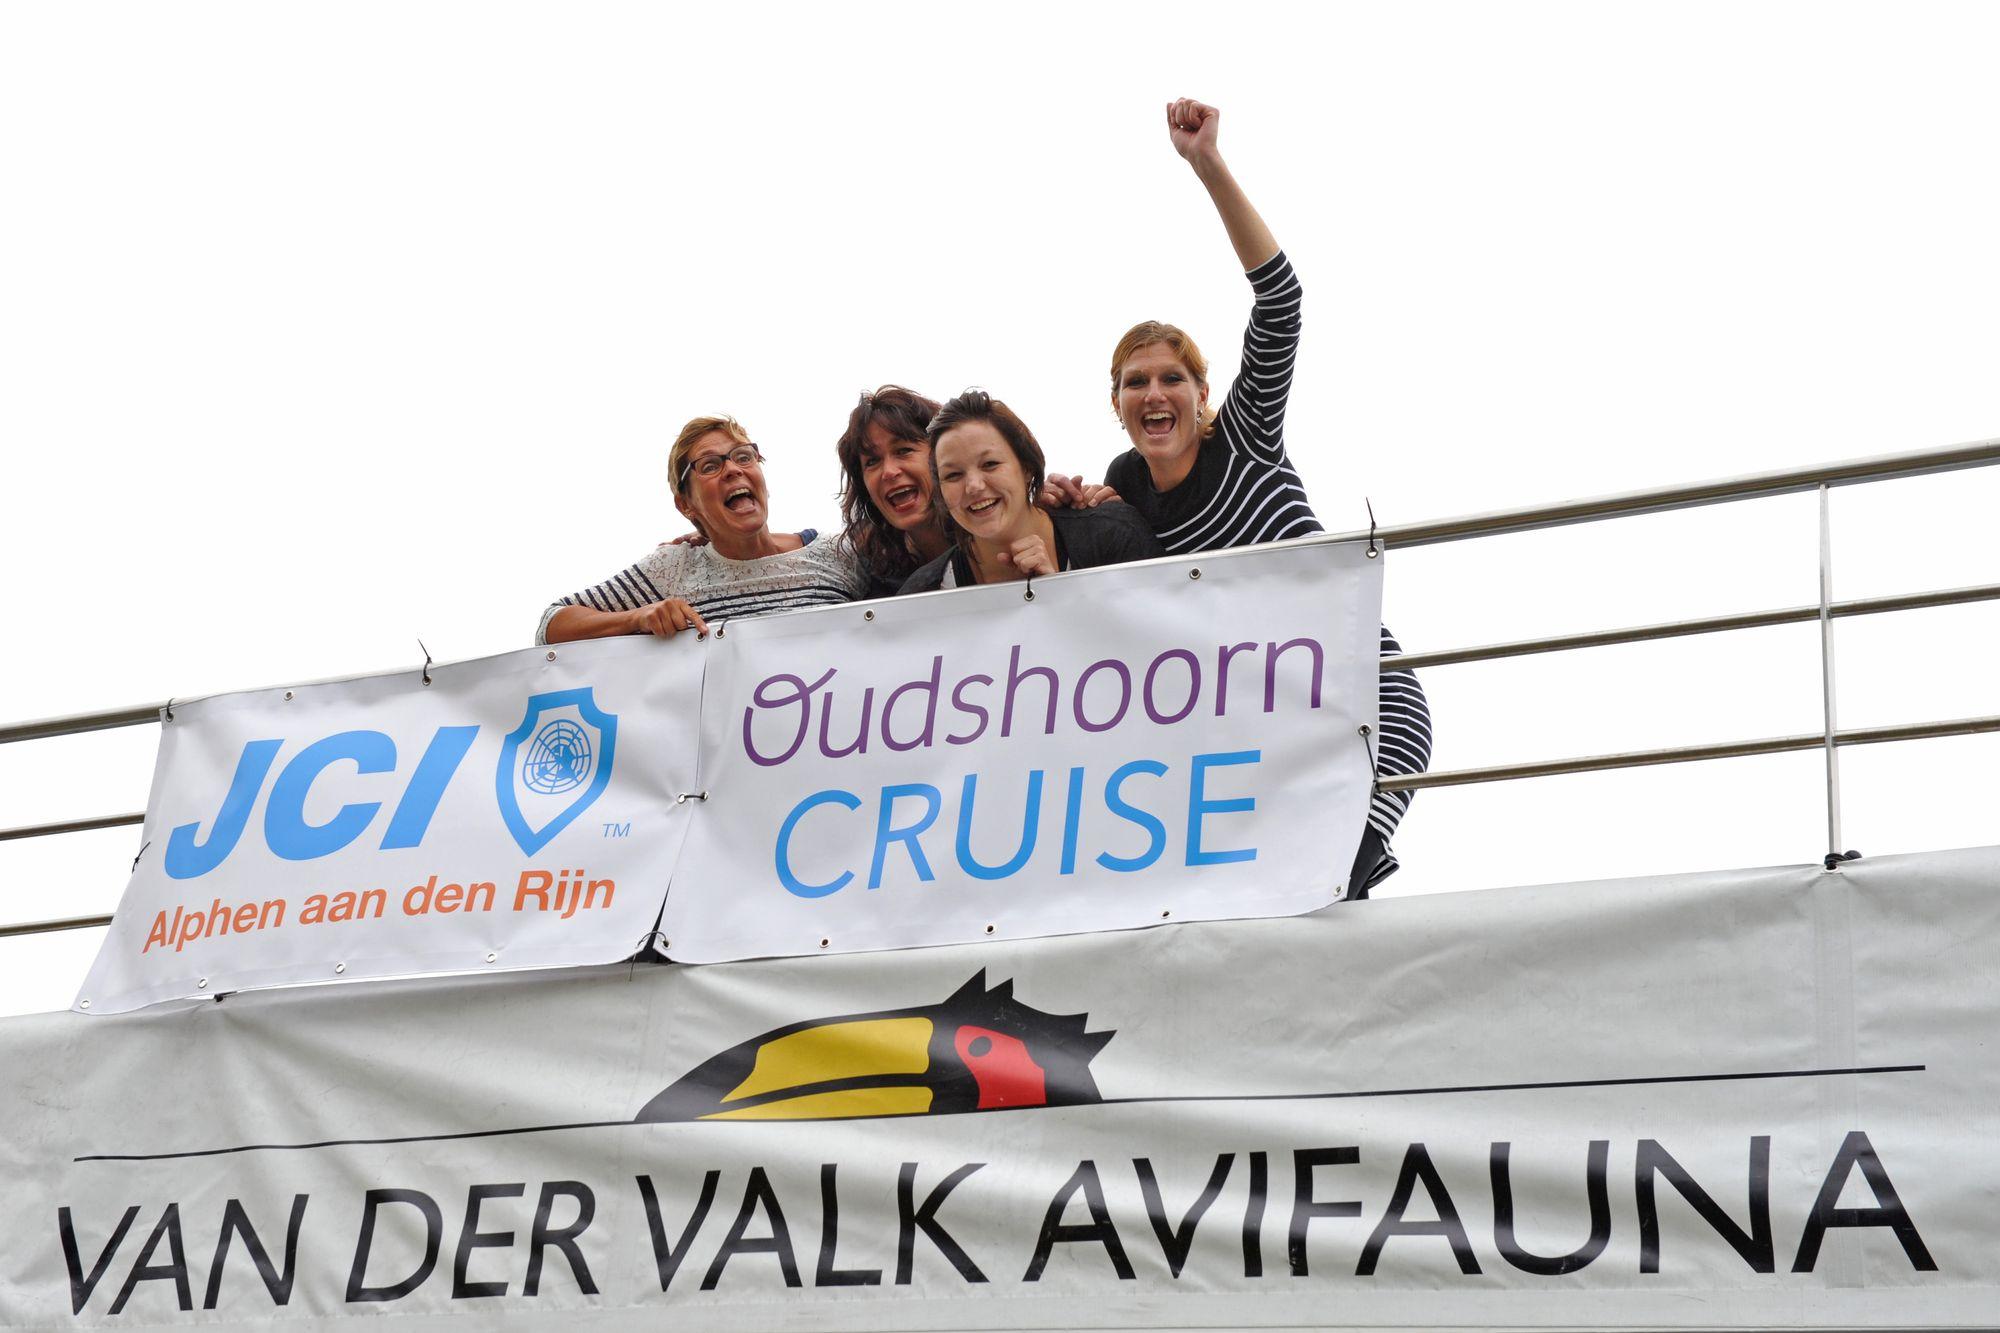 Oudshoorn Cruise